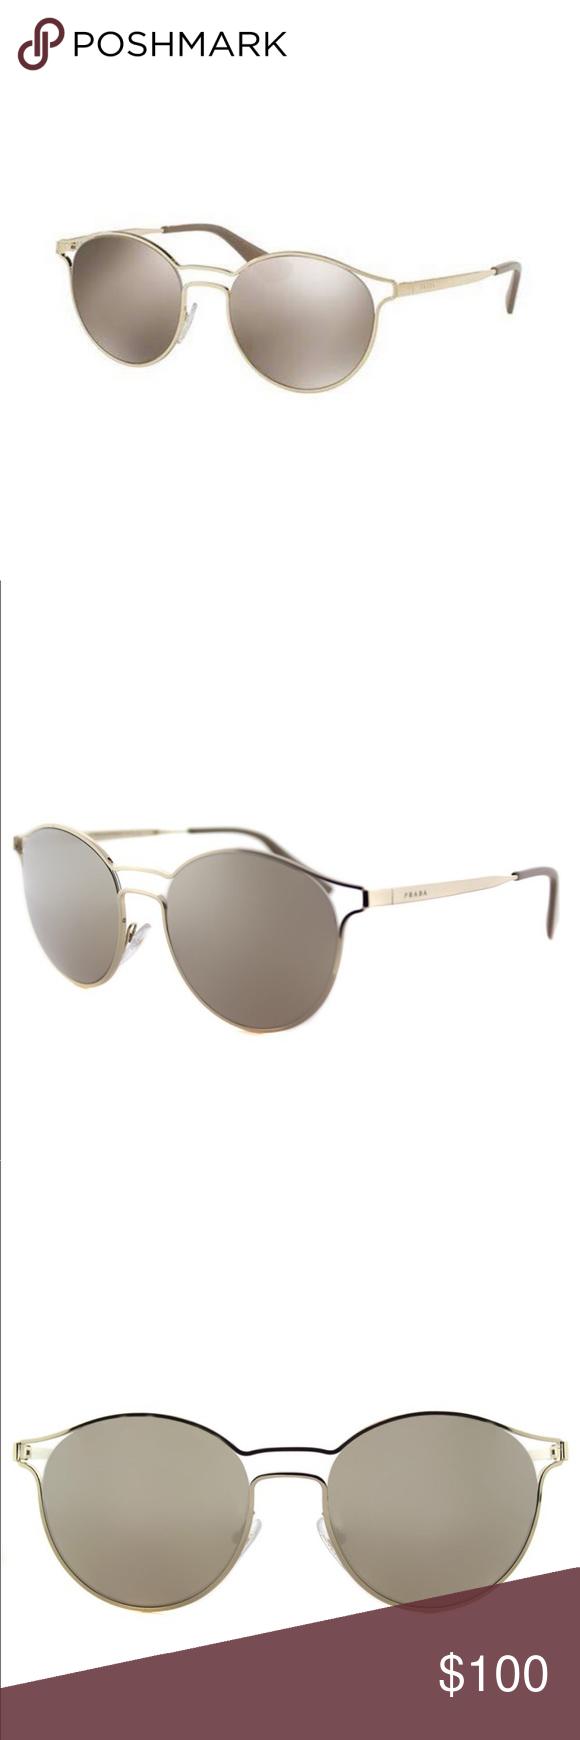 b1e859f4bf5ce Prada Metal Round Gold Mirror Lens Sunglasses Prada Cinema Pale Gold Metal  Round Gold Mirror Lens